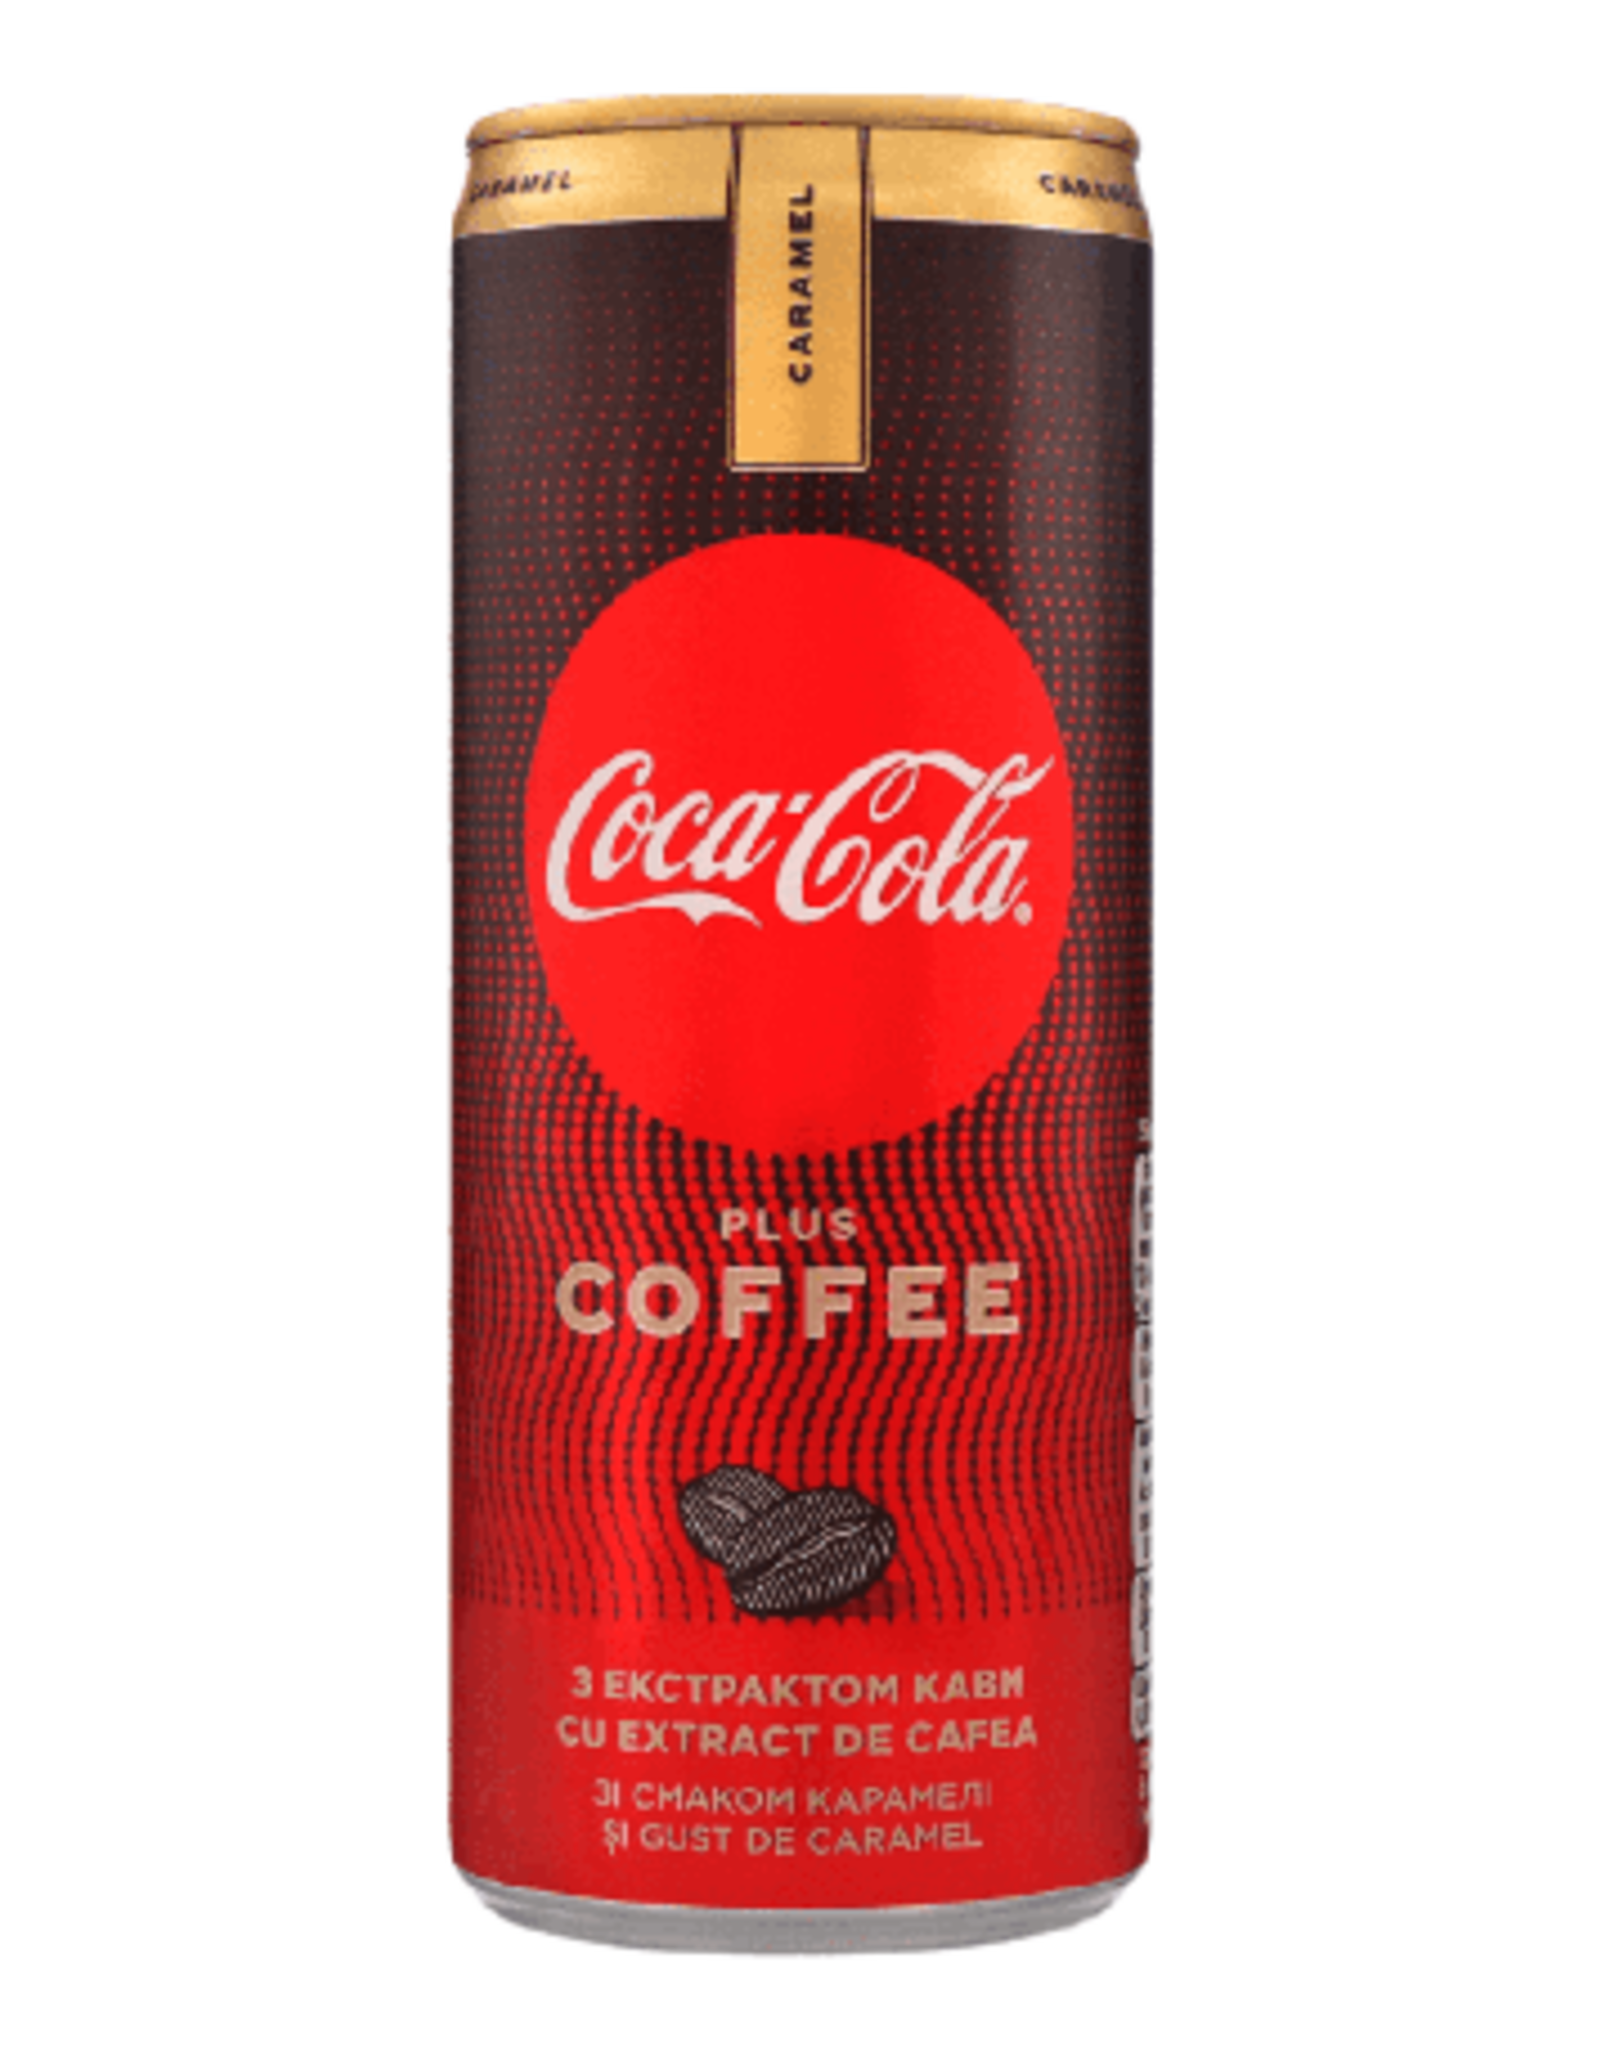 Coca Cola Caramel With Coffee